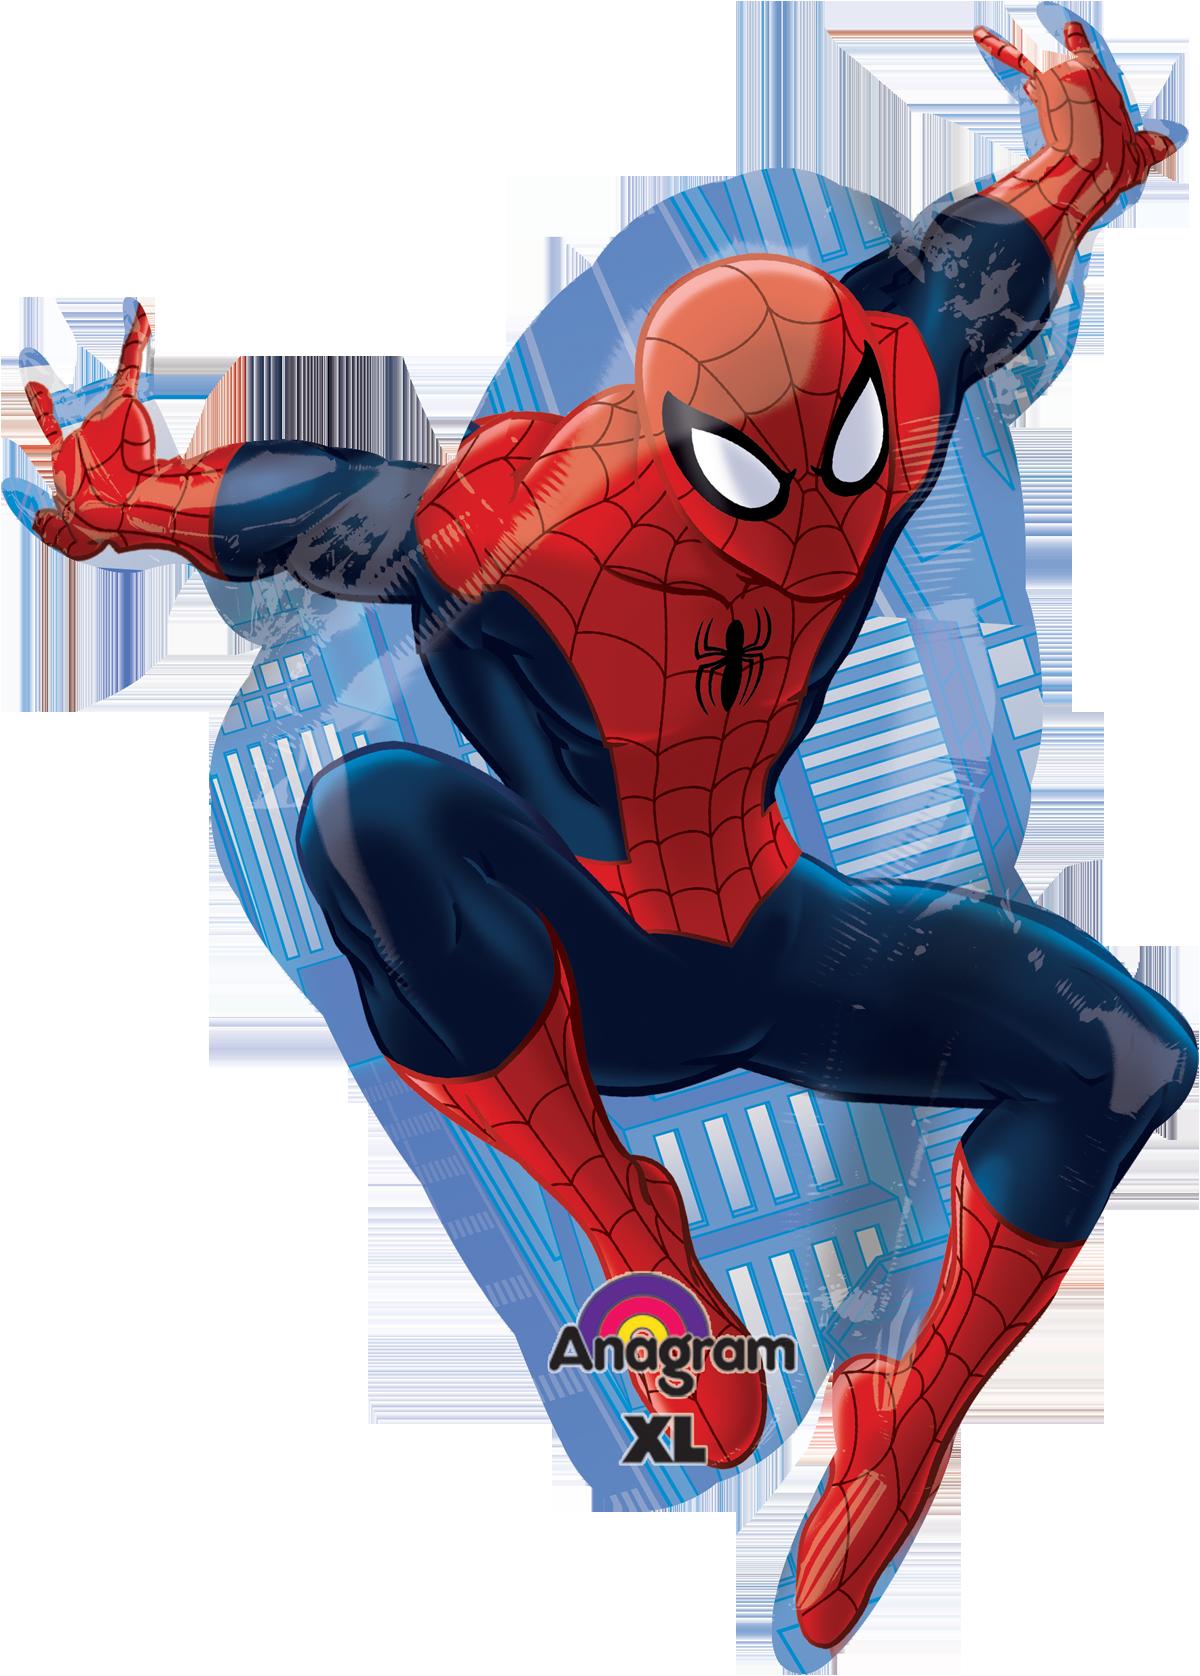 Spiderman globo SuperShape ConverGram  Globo de la Semana